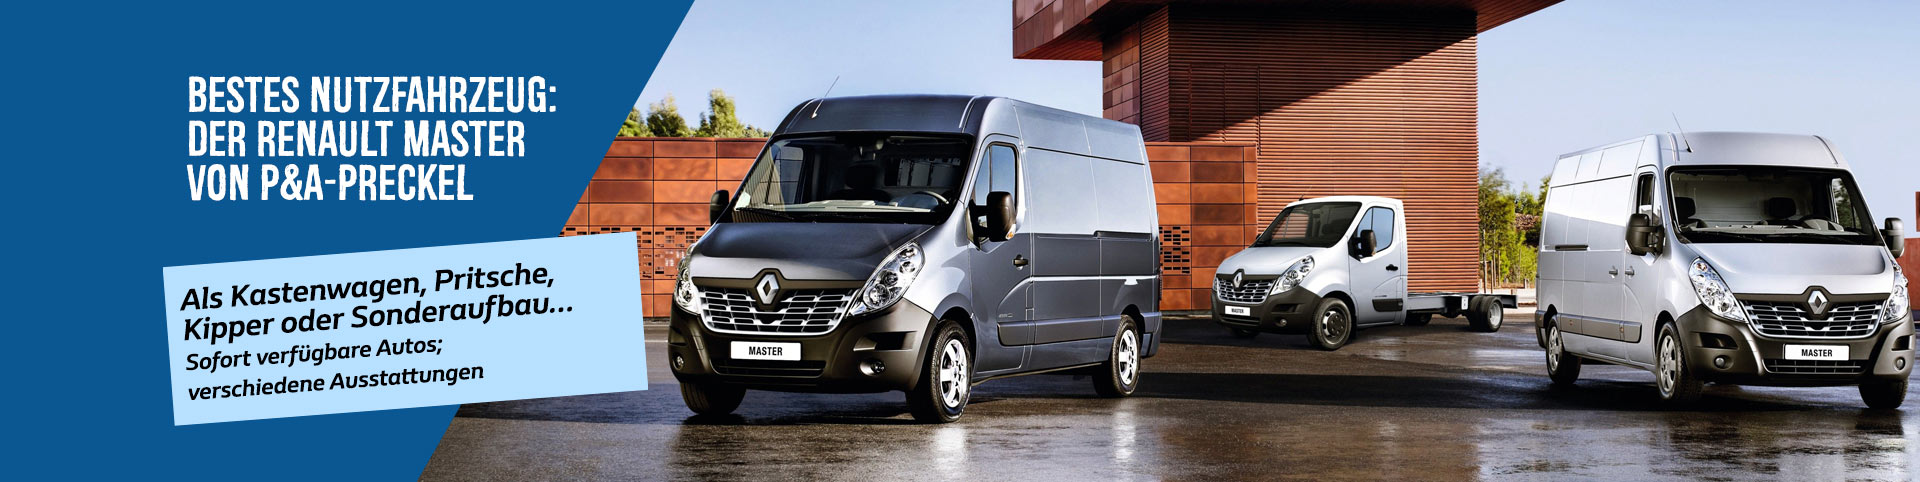 Renault Master Angebot bei P&A-Preckel